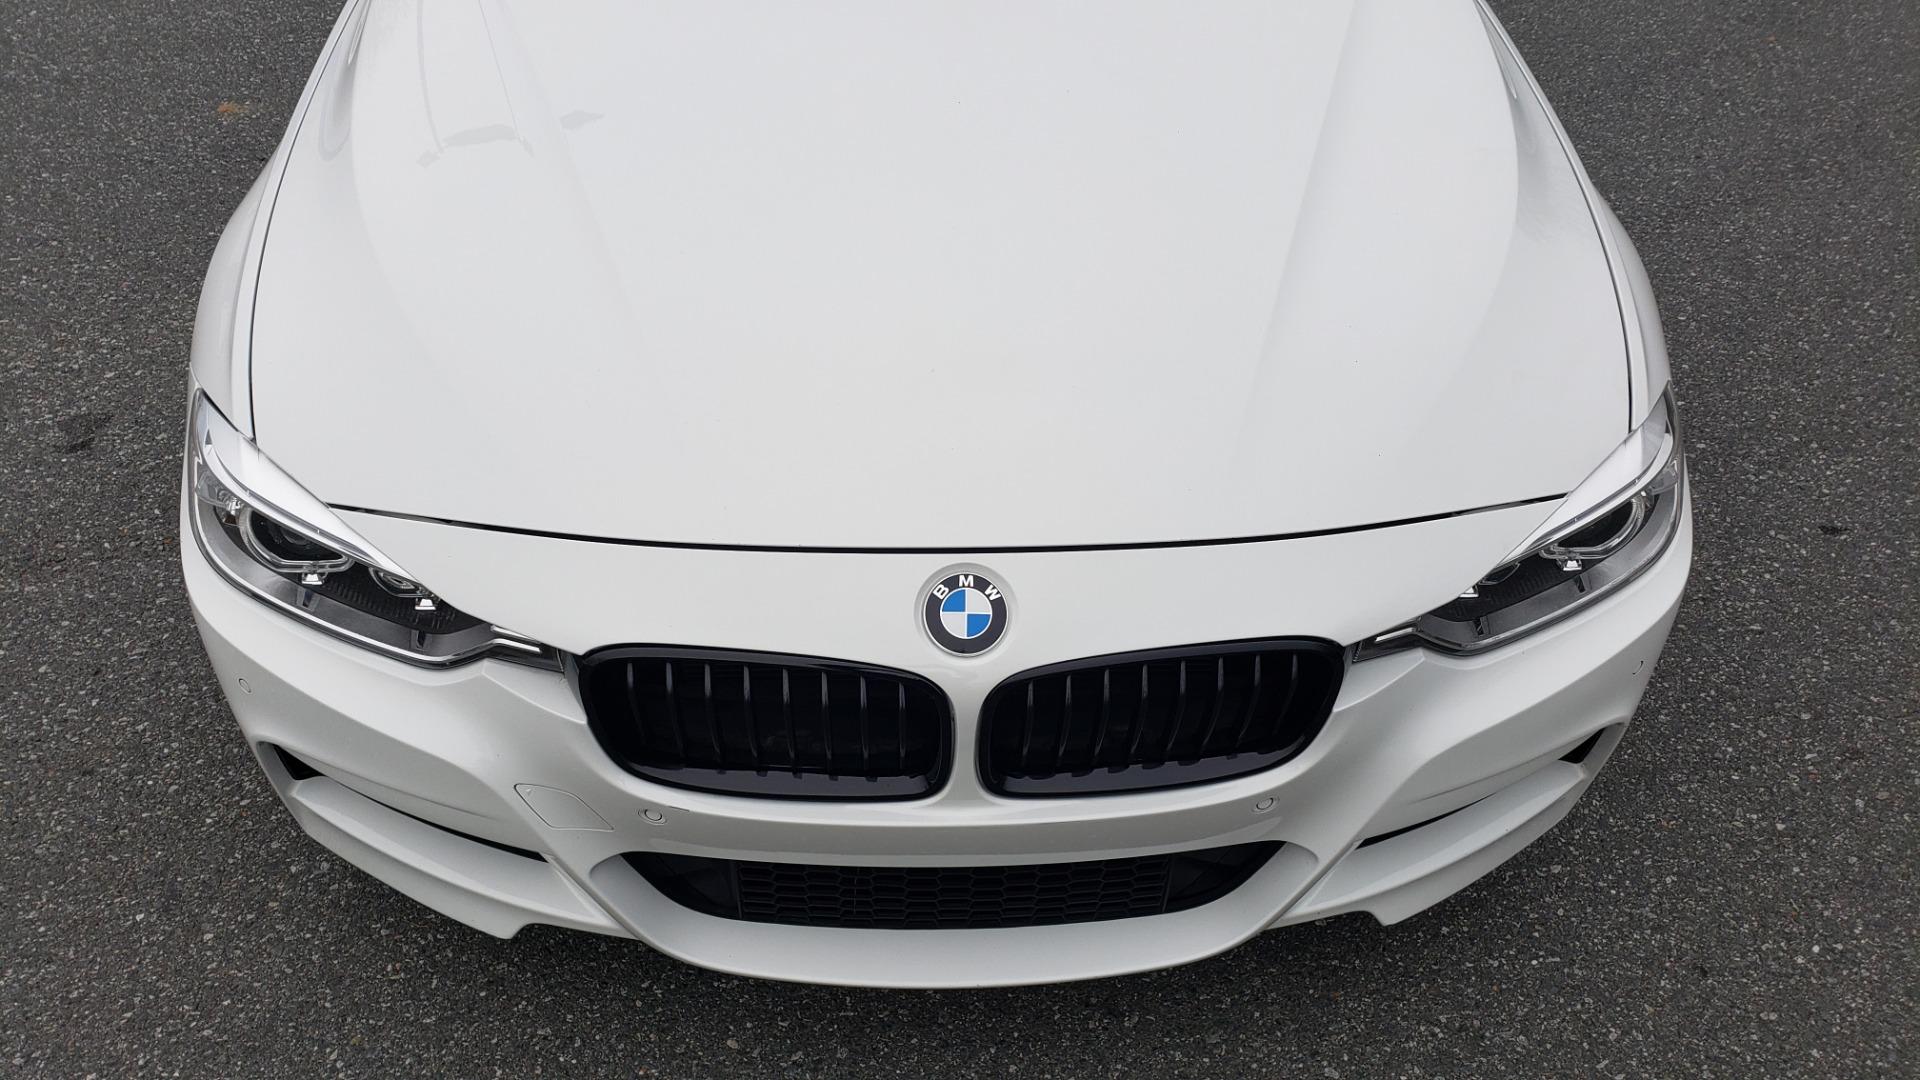 Used 2015 BMW 3 Series 335I M-SPORT / PREM PKG / HK SND / SUNROOF / REARVIEW for sale Sold at Formula Imports in Charlotte NC 28227 16